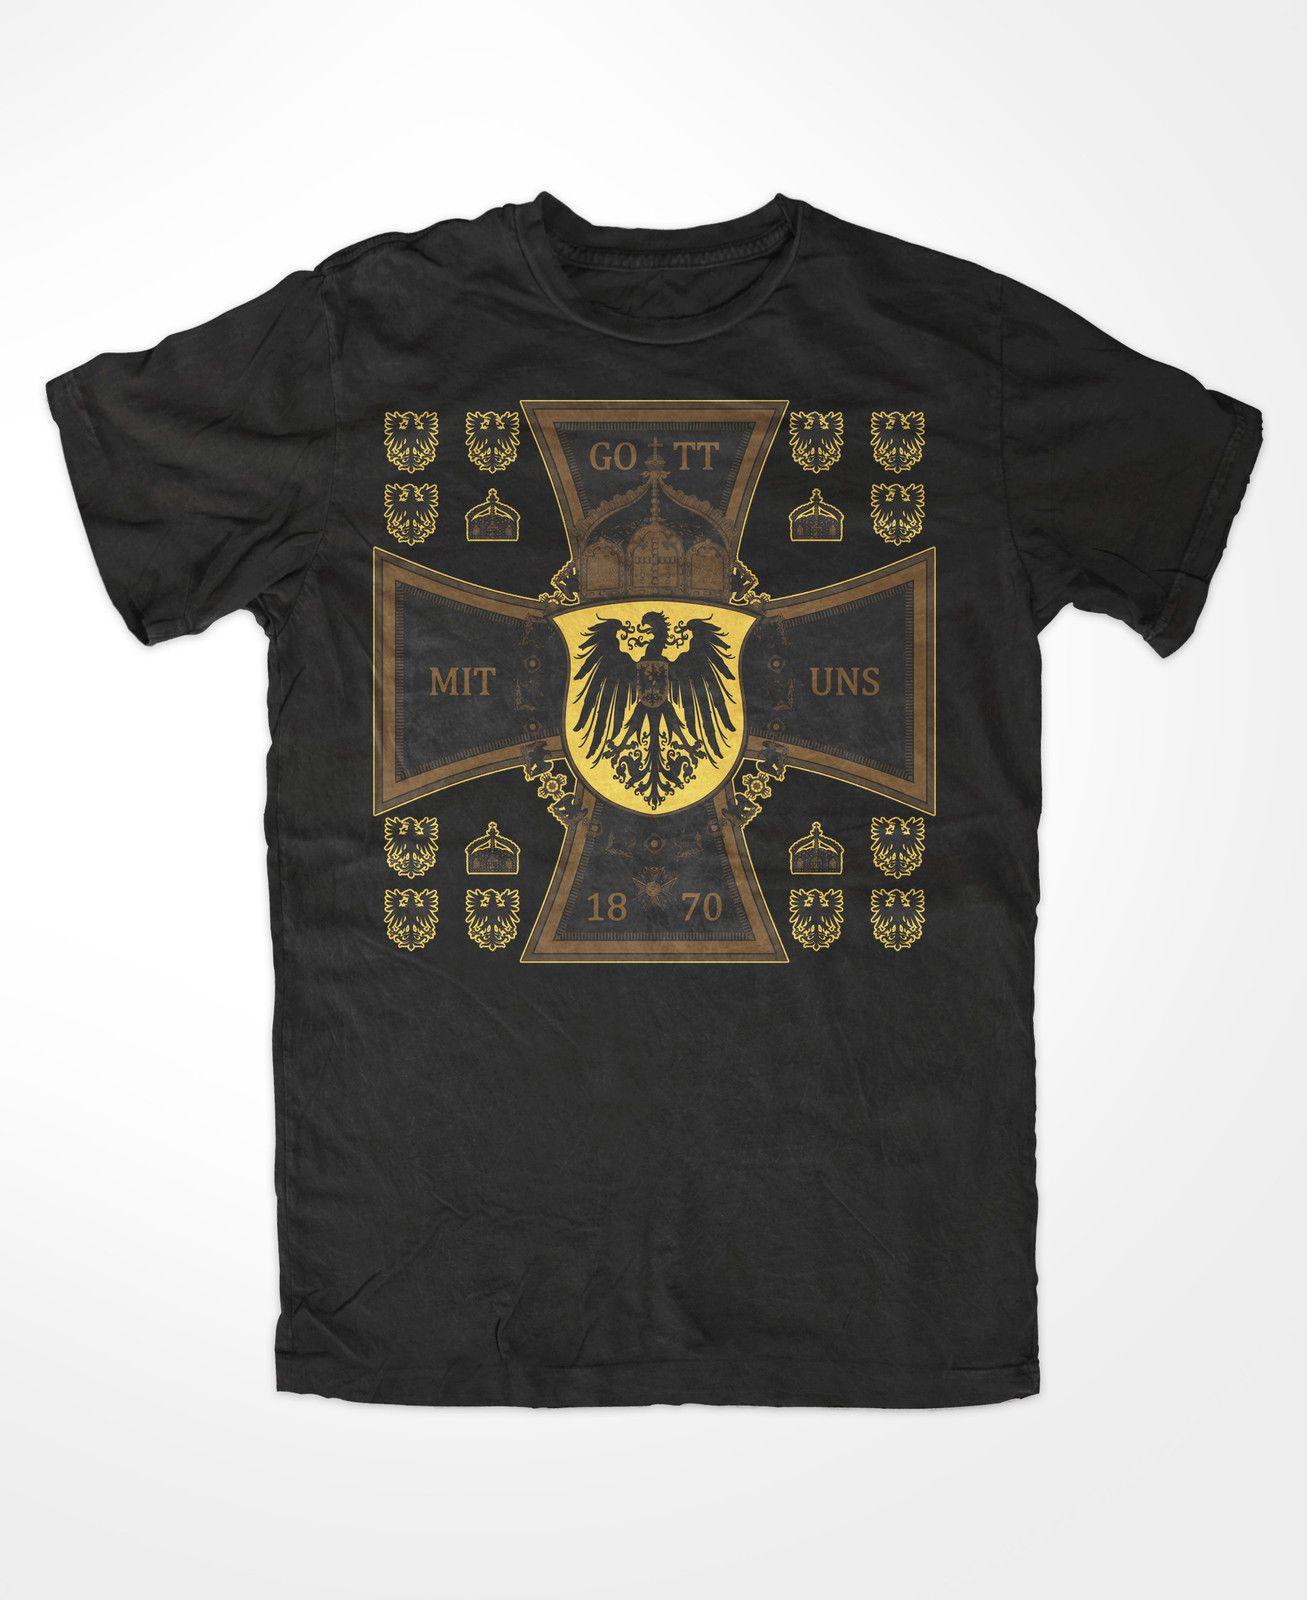 Gott Mit Uns Herren T Shirt , Kreuz,Adler,Preussen,ProGloriaetPatria,Kaiserreich  Funky T Shirts For Women T Shirt Purchase From Lovetshirts29, ... 599e22a08c